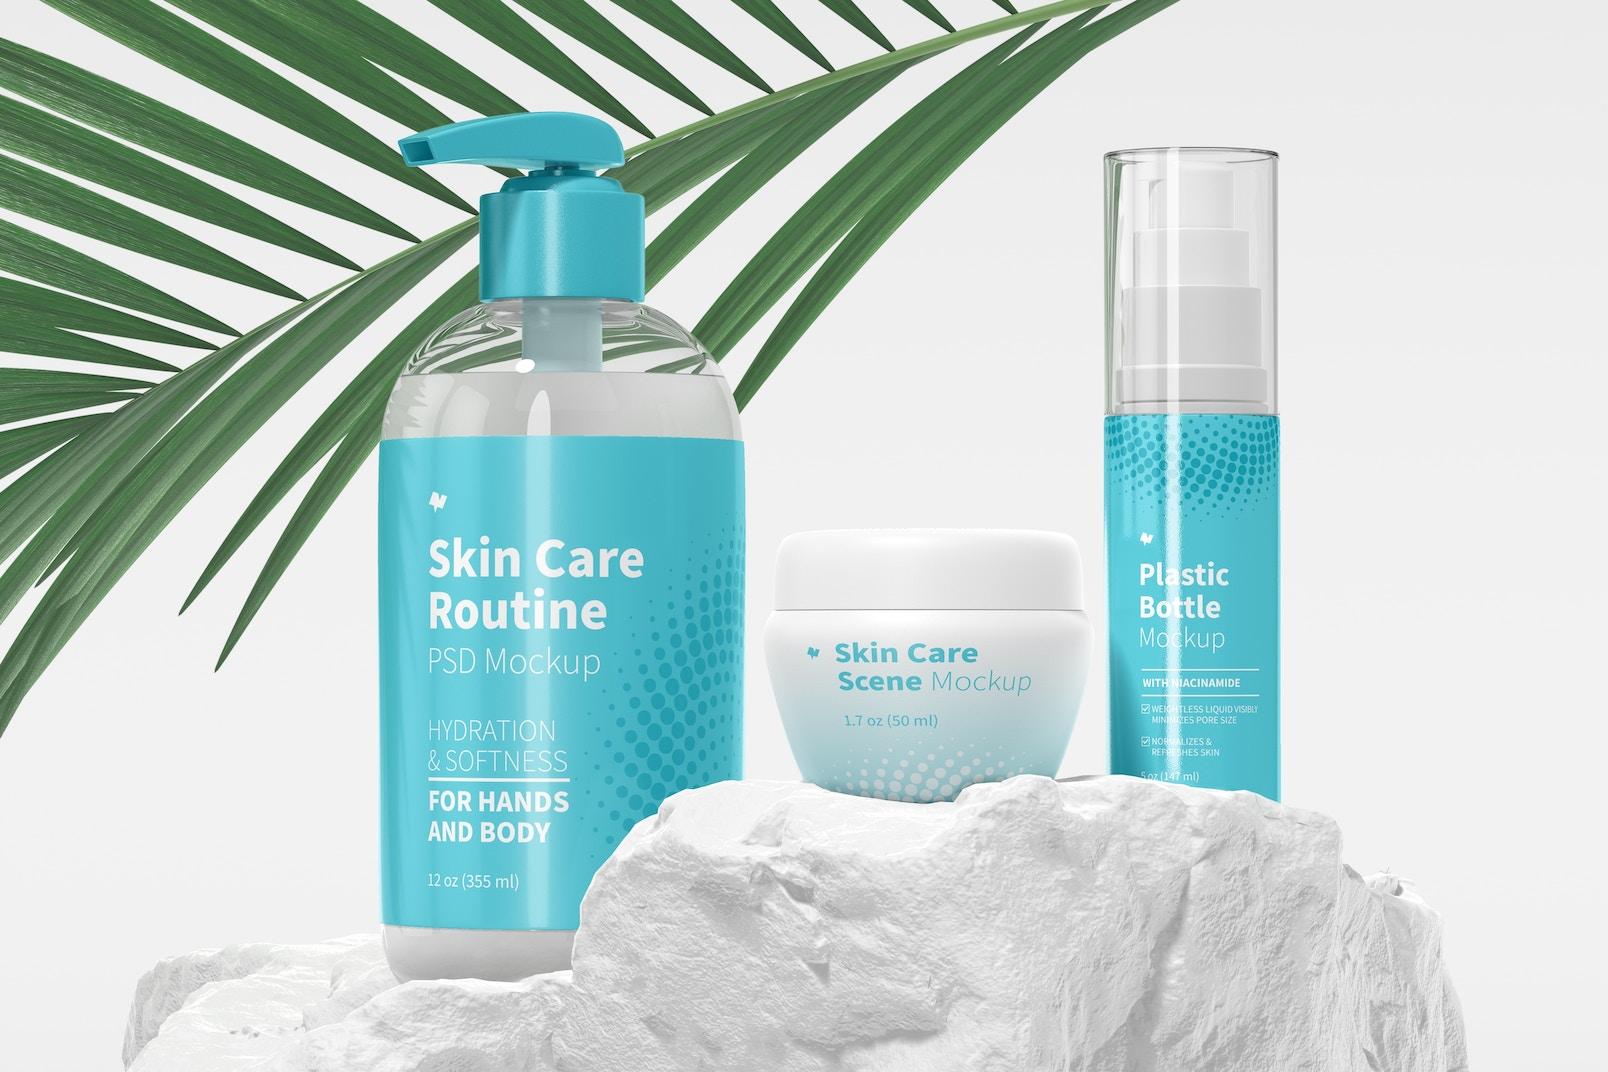 Skin Care Routine Scene Mockup, Front View